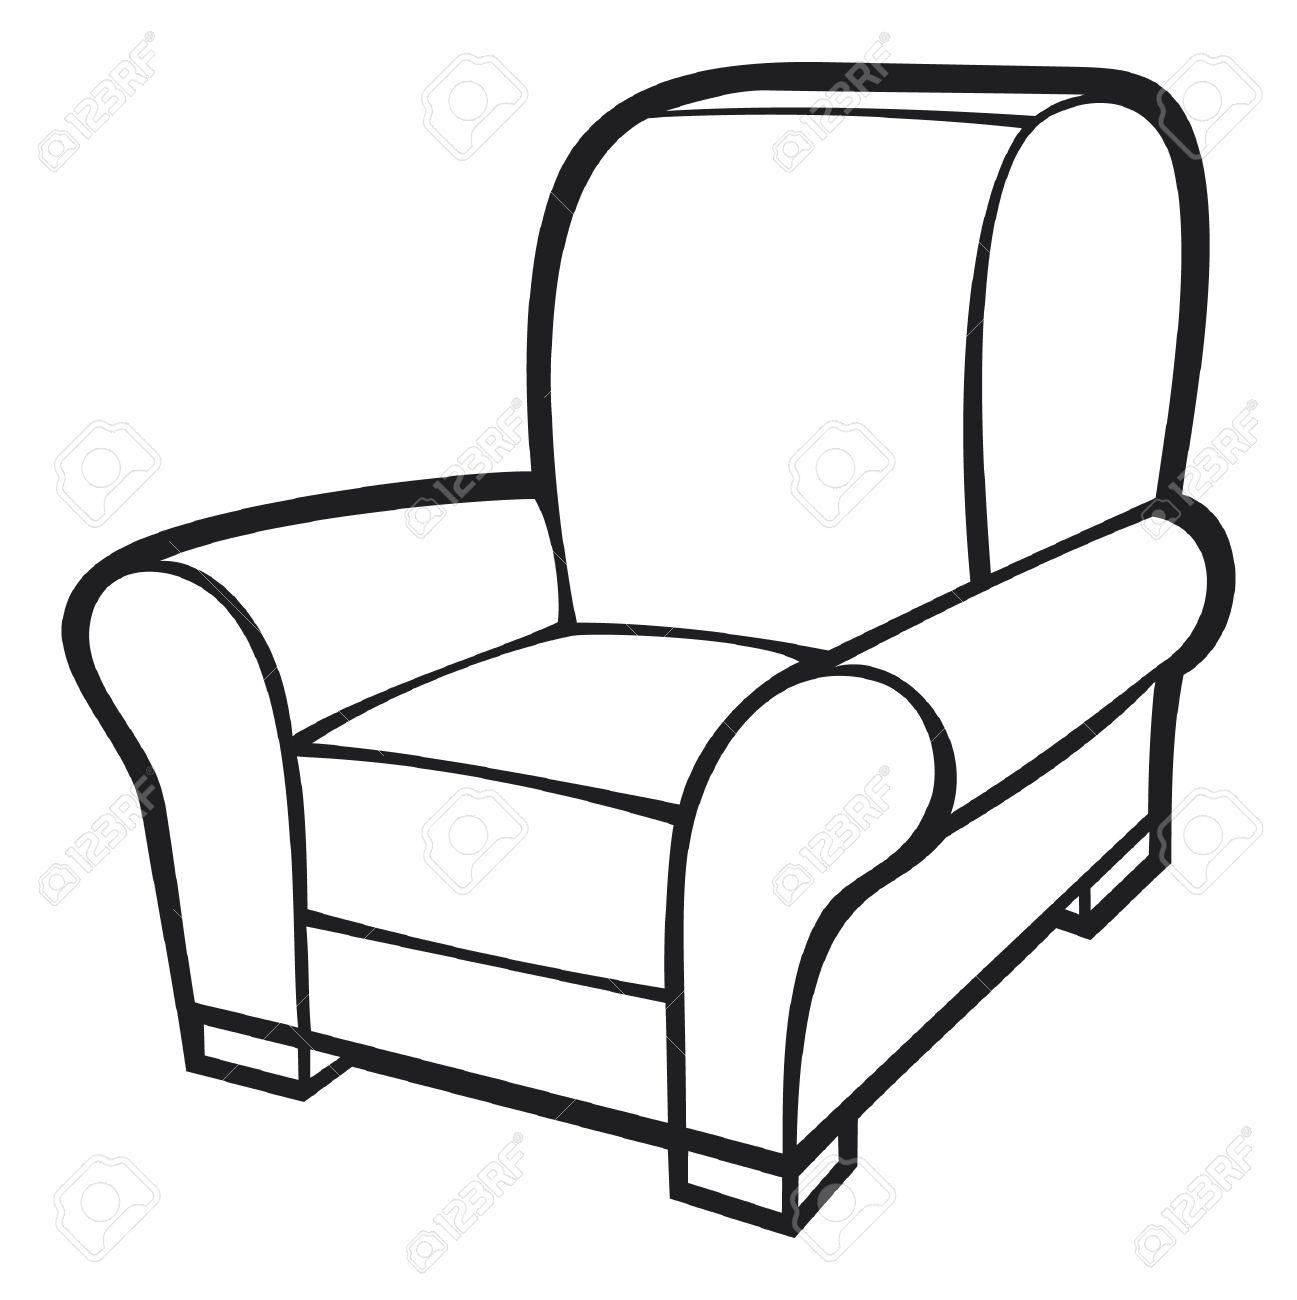 1297x1300 Sofa Clipart Black And White